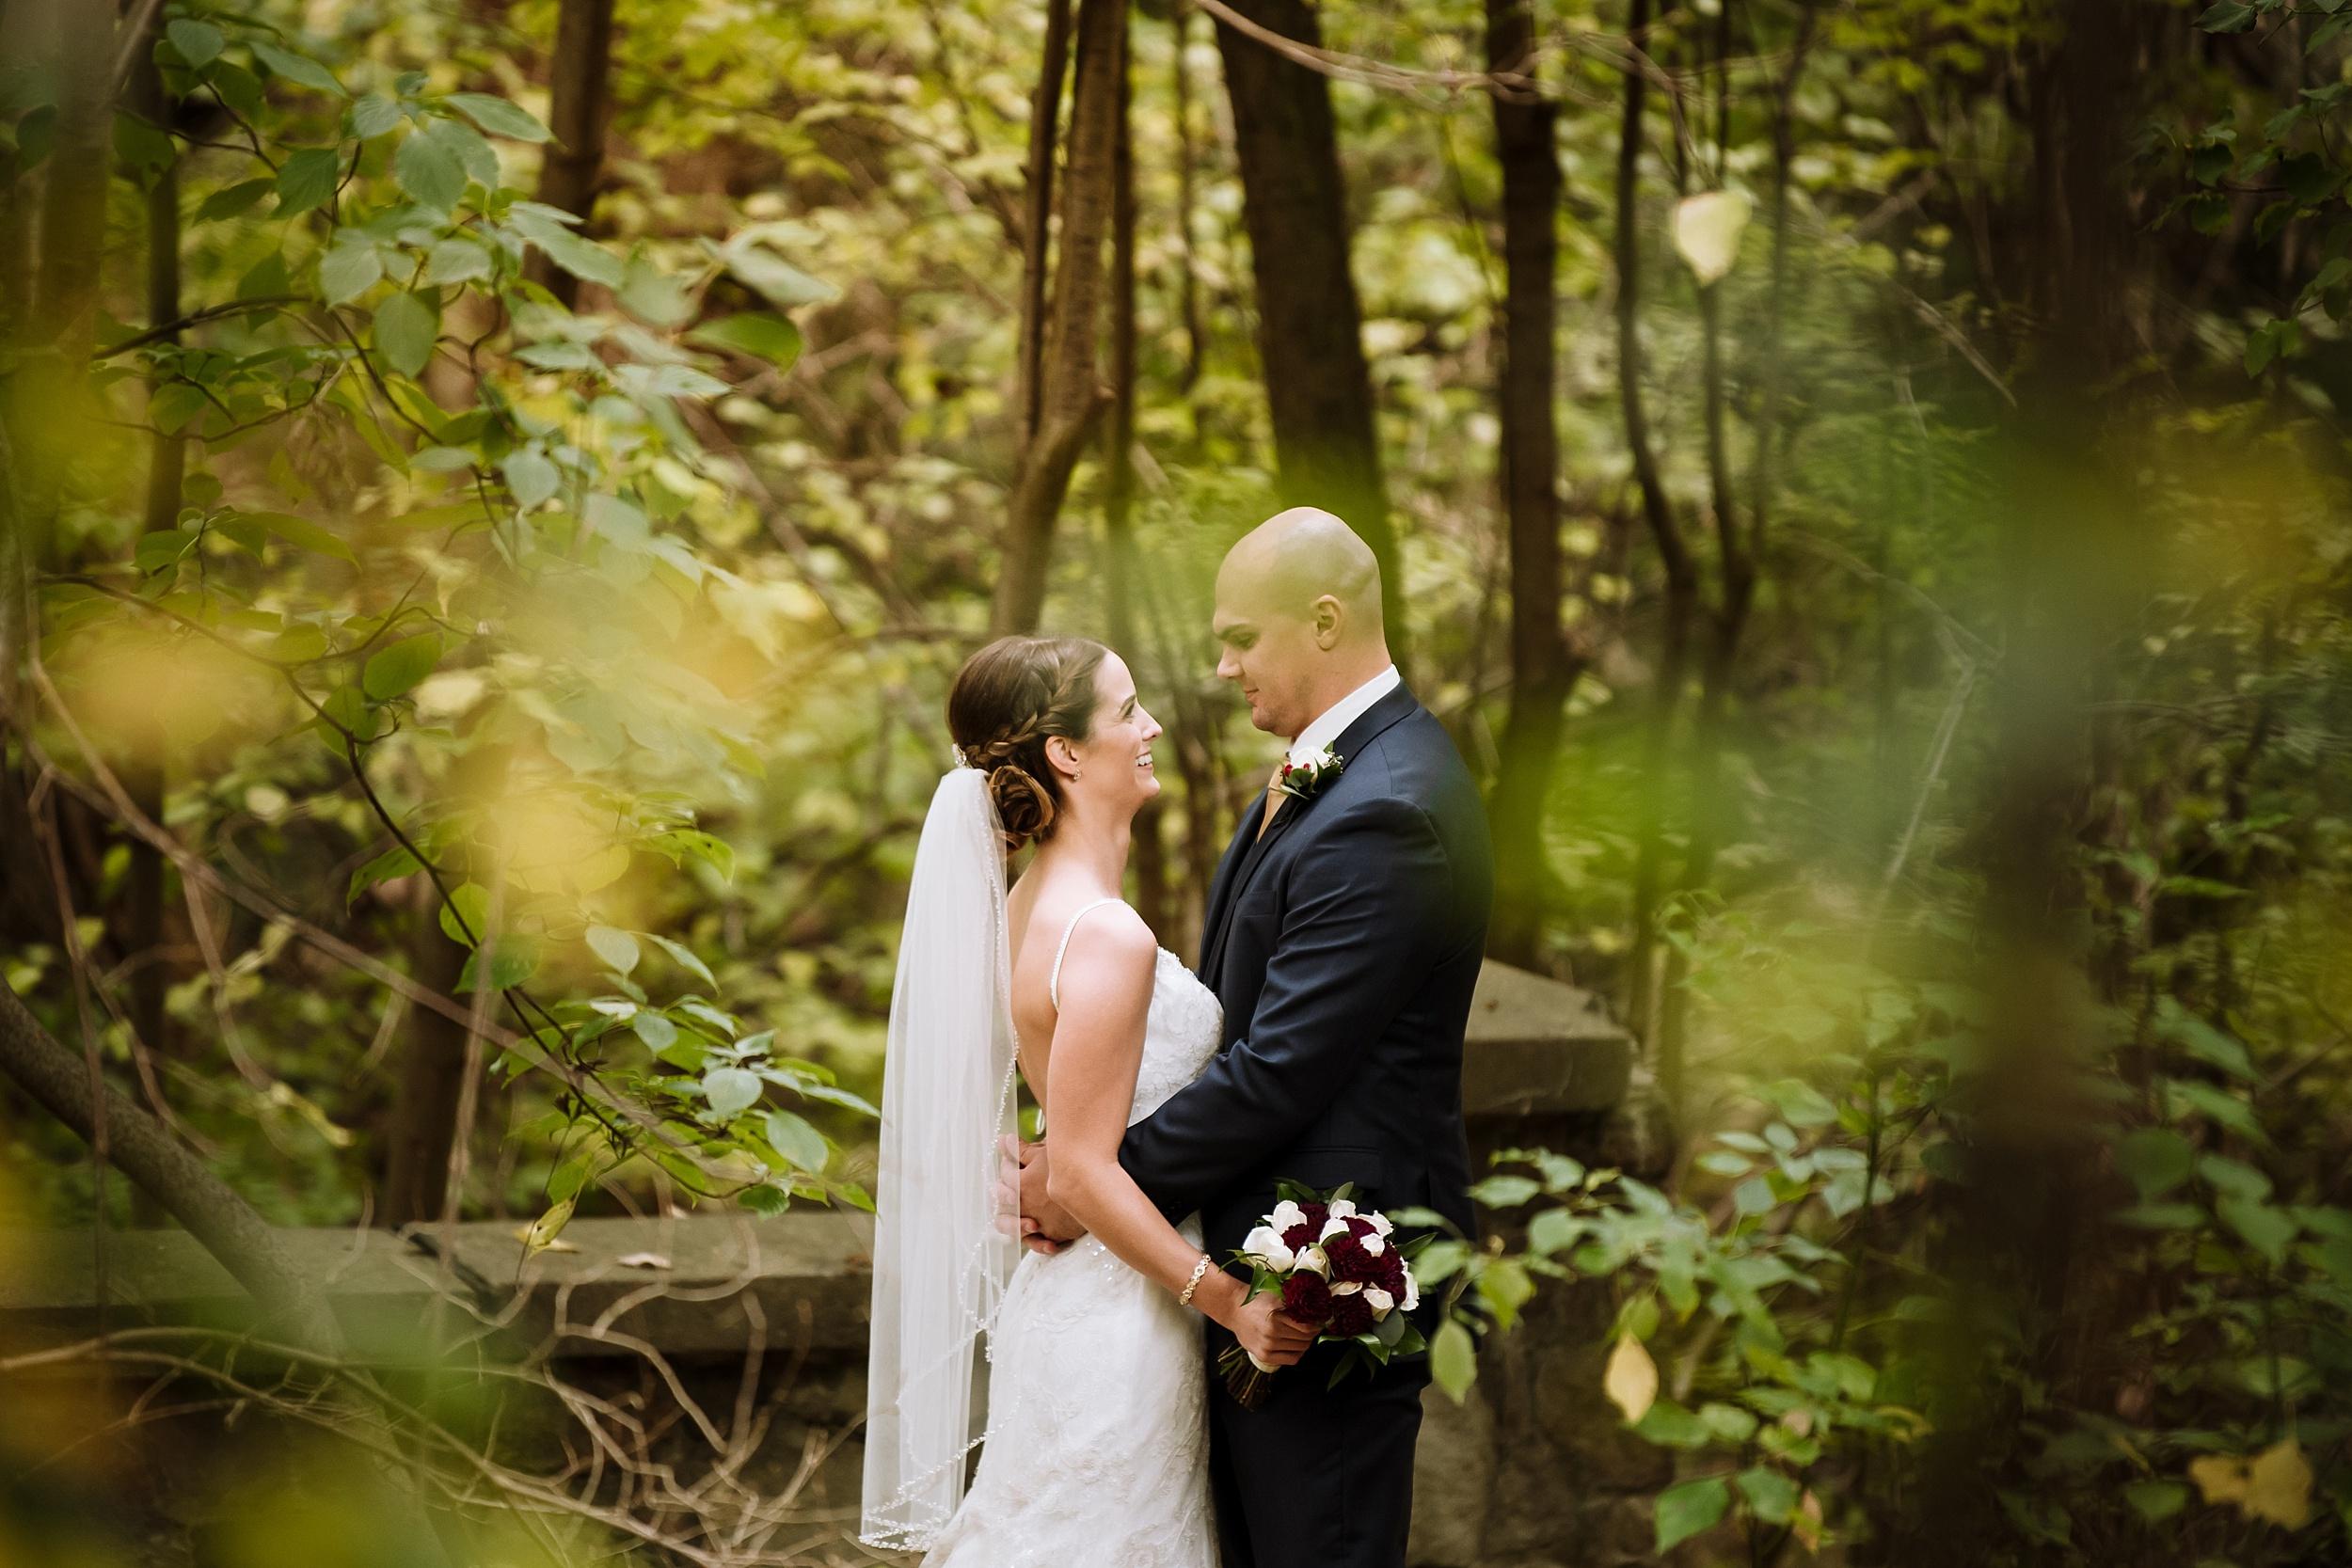 Windemere_Manor_Fall_Wedding_London_Toronto_Wedding_Photographer_0016.jpg